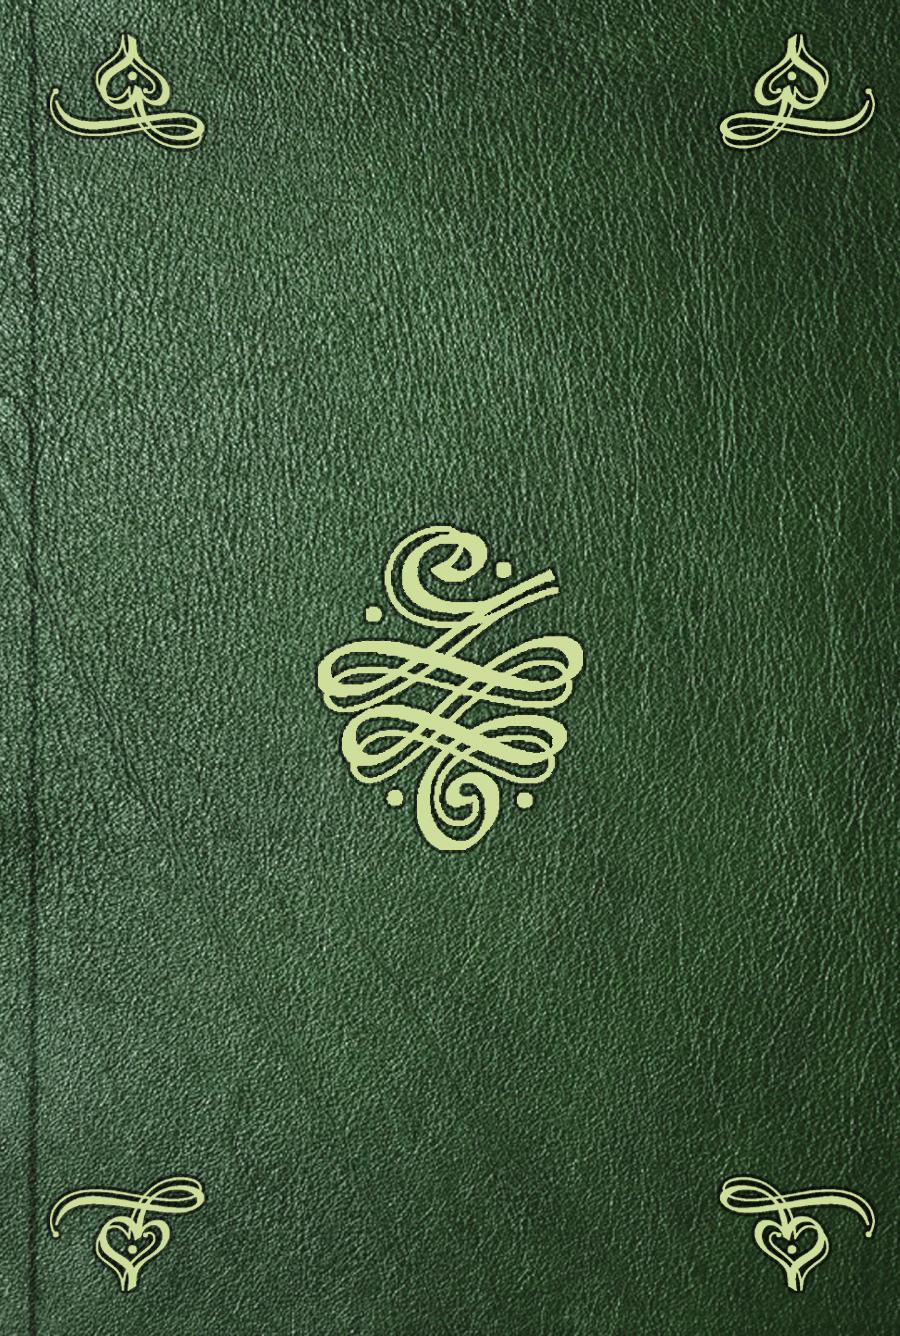 Charlotte-Elizabeth de Baviere Fragmens de lettres originales. T. 1 renée caroline de froulay créquy lettres inedites de la marquise de crequi a senac de meilhan 1782 1789